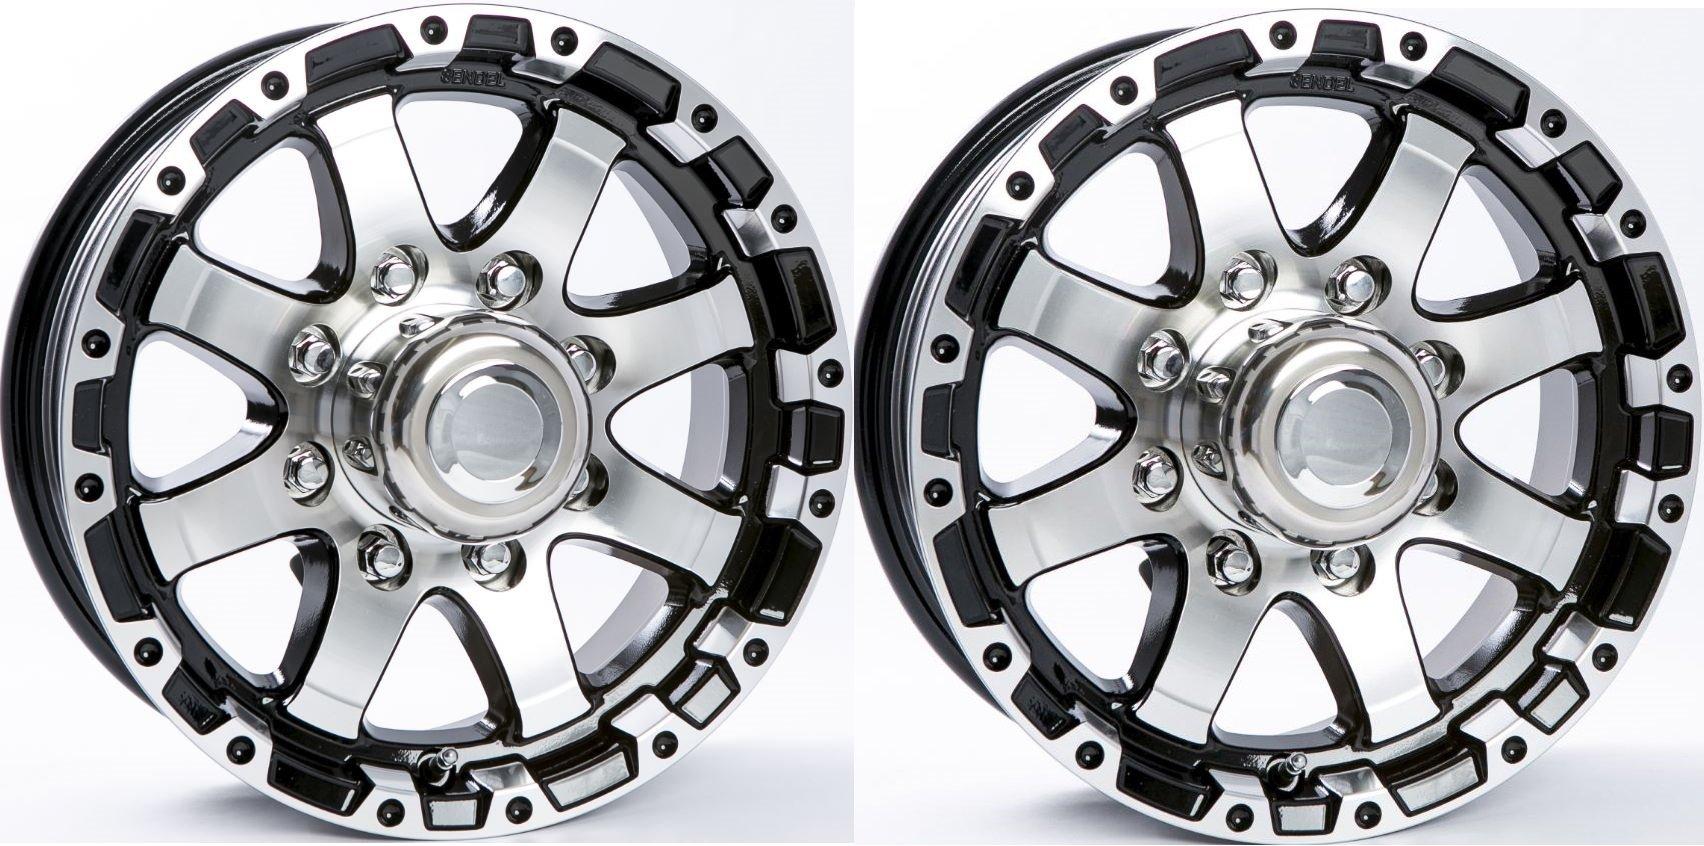 TWO (2) Aluminum Sendel Trailer Rims Wheels 8 Lug 16'' T08 Silver/Black Style by eCustomRim (Image #1)